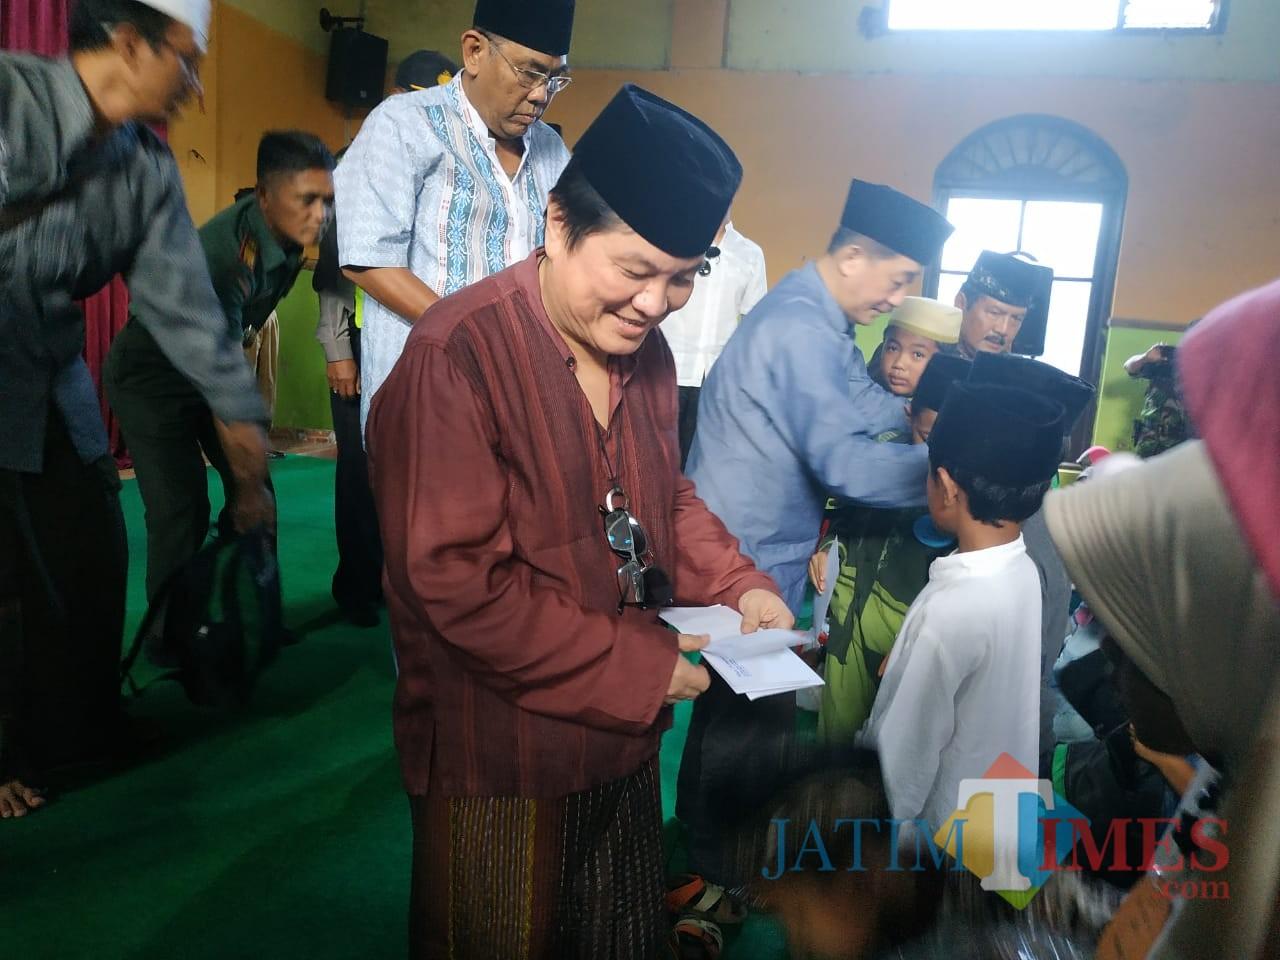 Komisaris PT Anugerah Citra Abadi Iwan Kurniawan (paling kiri) saat memberikan santunan kepada anak yatim dan kaum dhuafa, Selasa (21/5/2019)(Hendra Saputra)